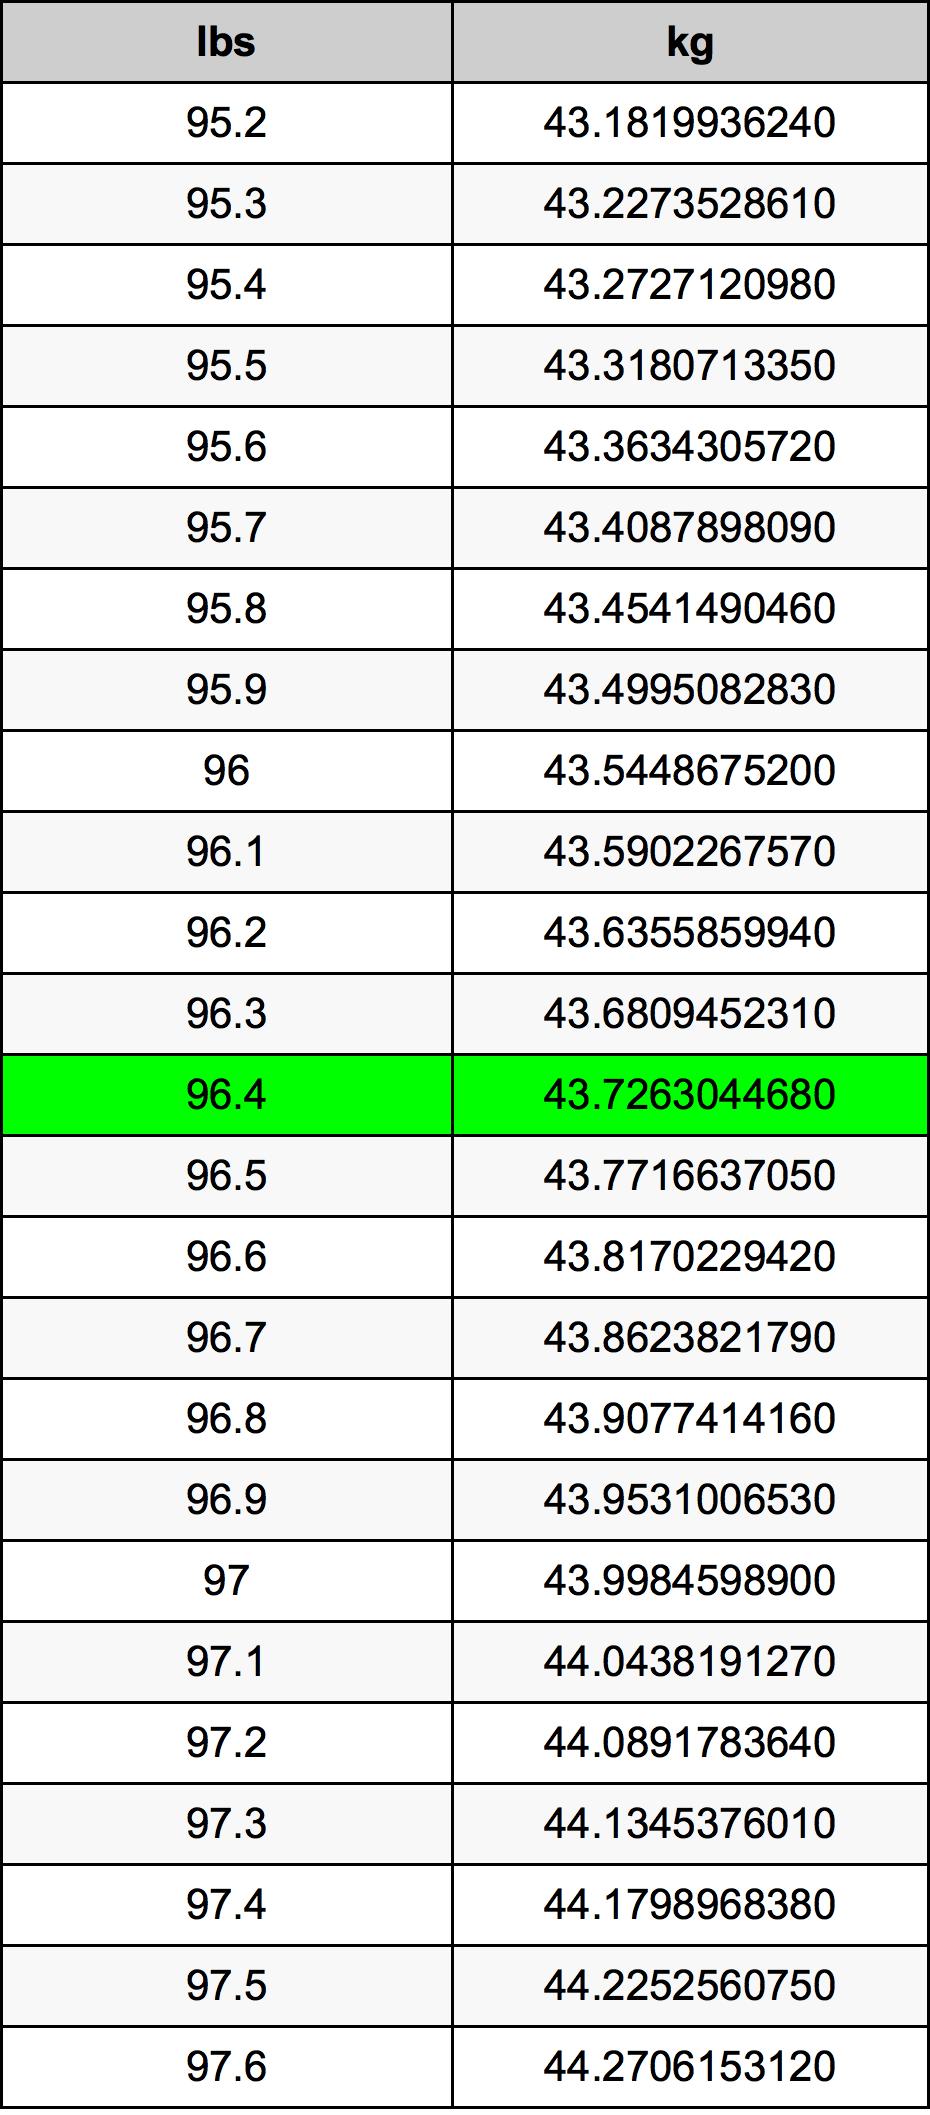 96.4 Libra konverteringstabellen